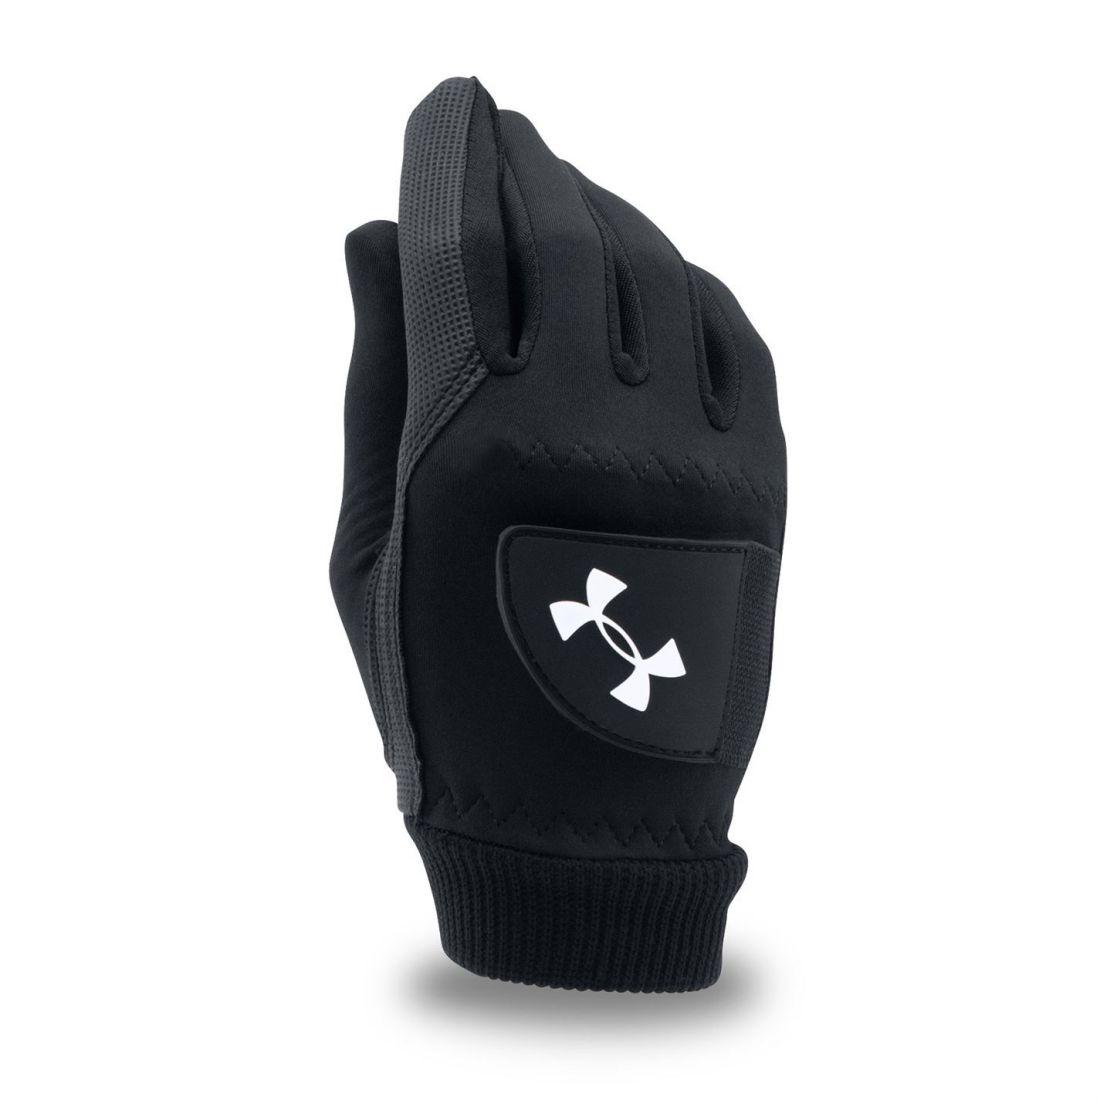 Details about Under Armour Womens Coldgear Glove Winter Golf Gloves Warm  Elasticated Cuffs 55222efaf3